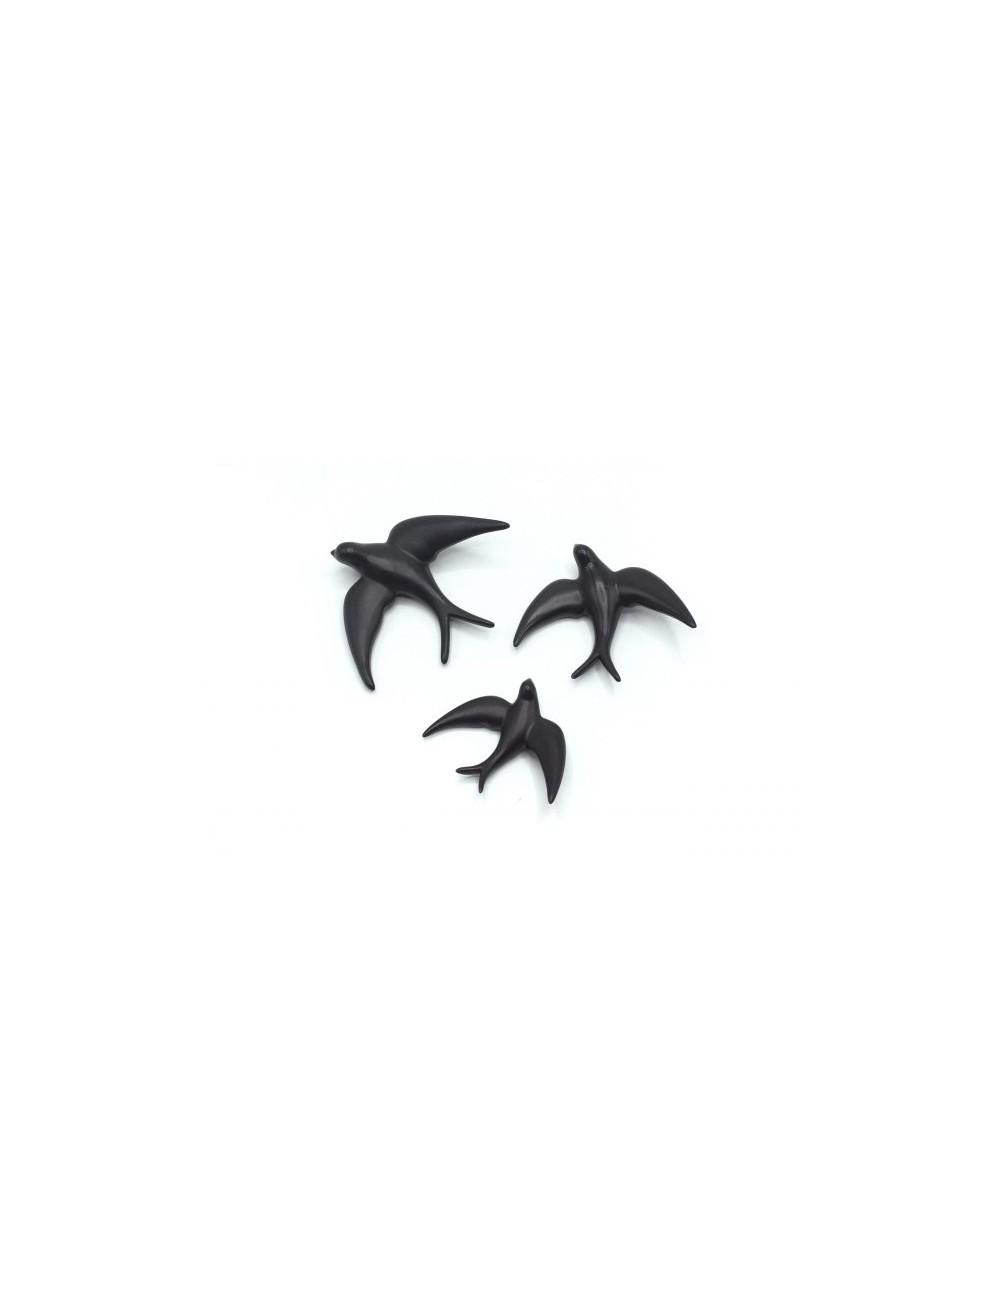 Golondrina negra mate grande